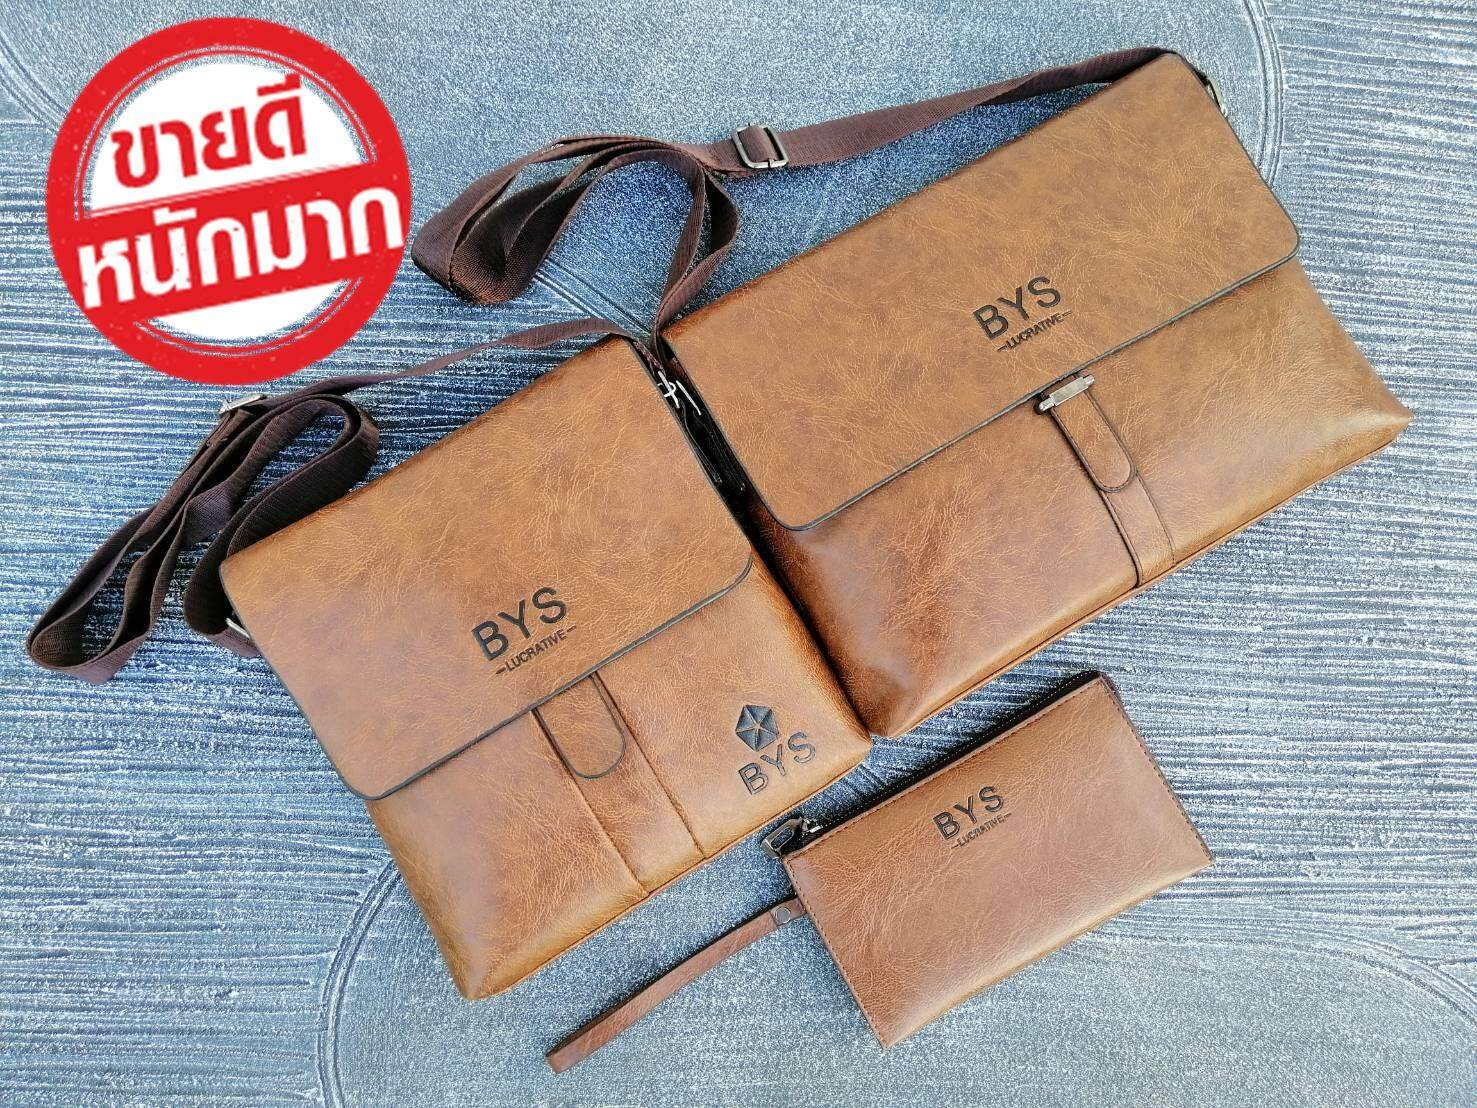 Mens Cowhide Leather Messenger bags Business Shoulder bags Crocodile pattern Coffee - intl .